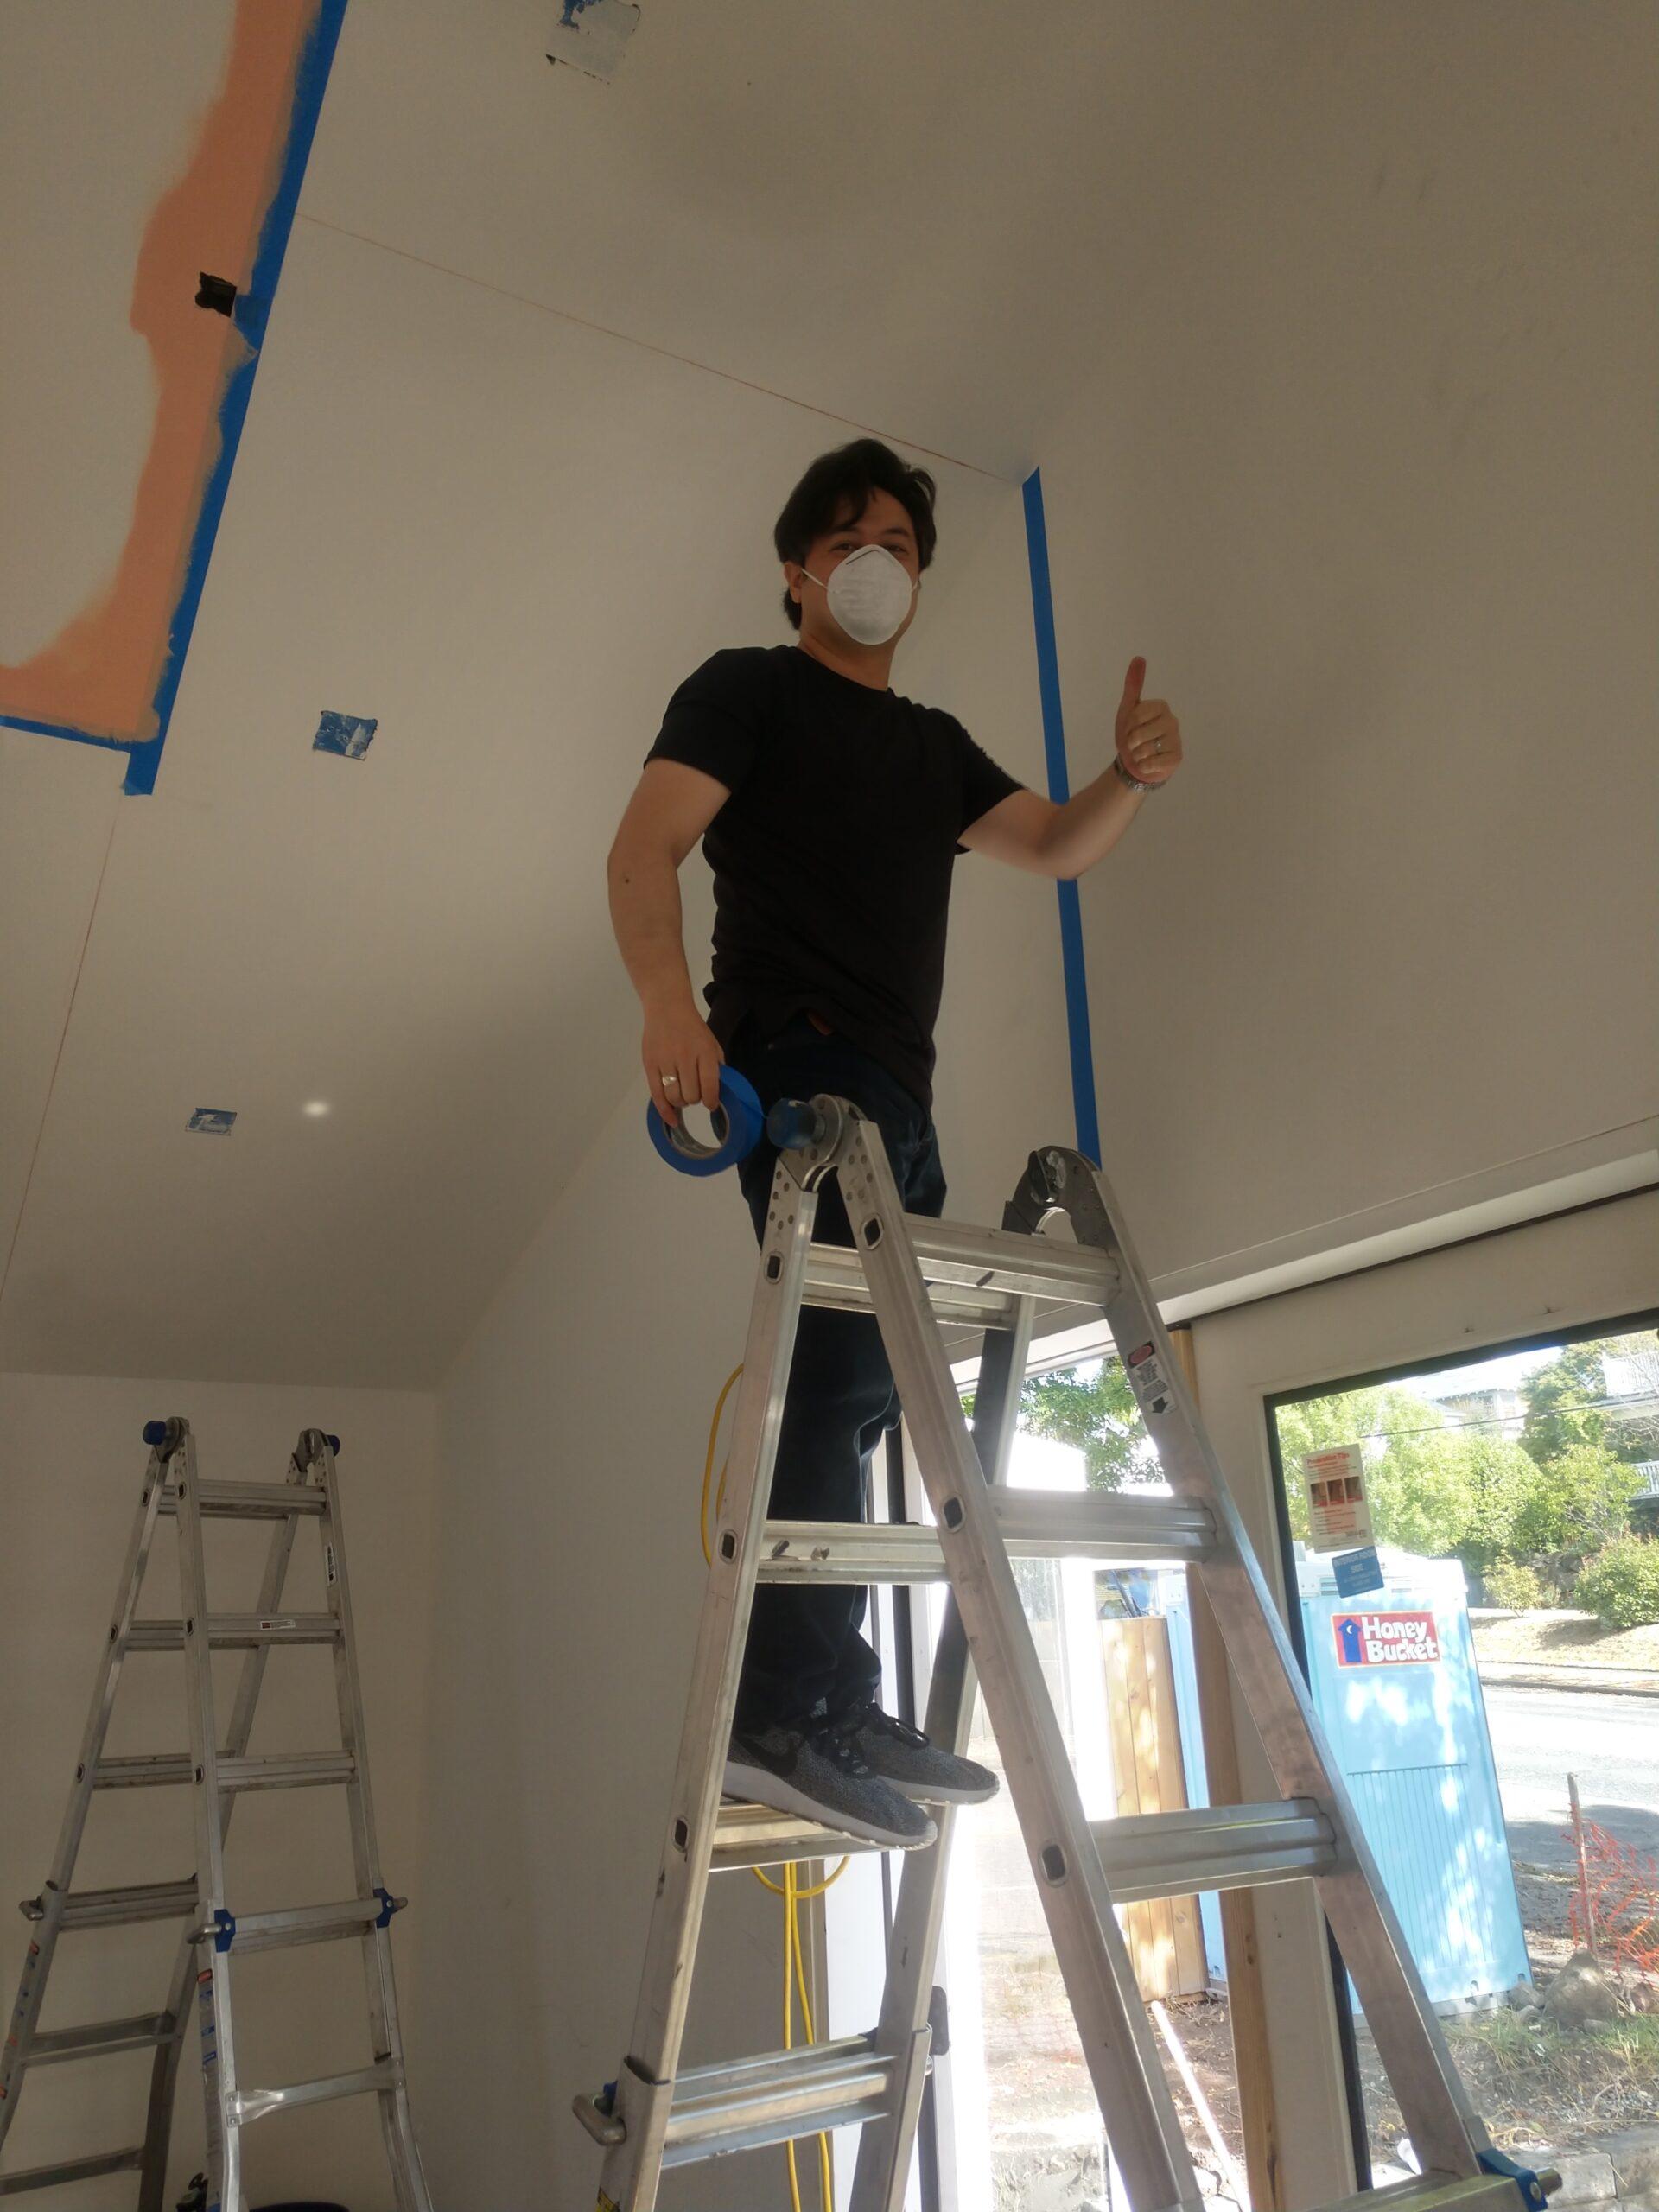 Rushing's Nathan Denni preparing to paint Estelita's Library